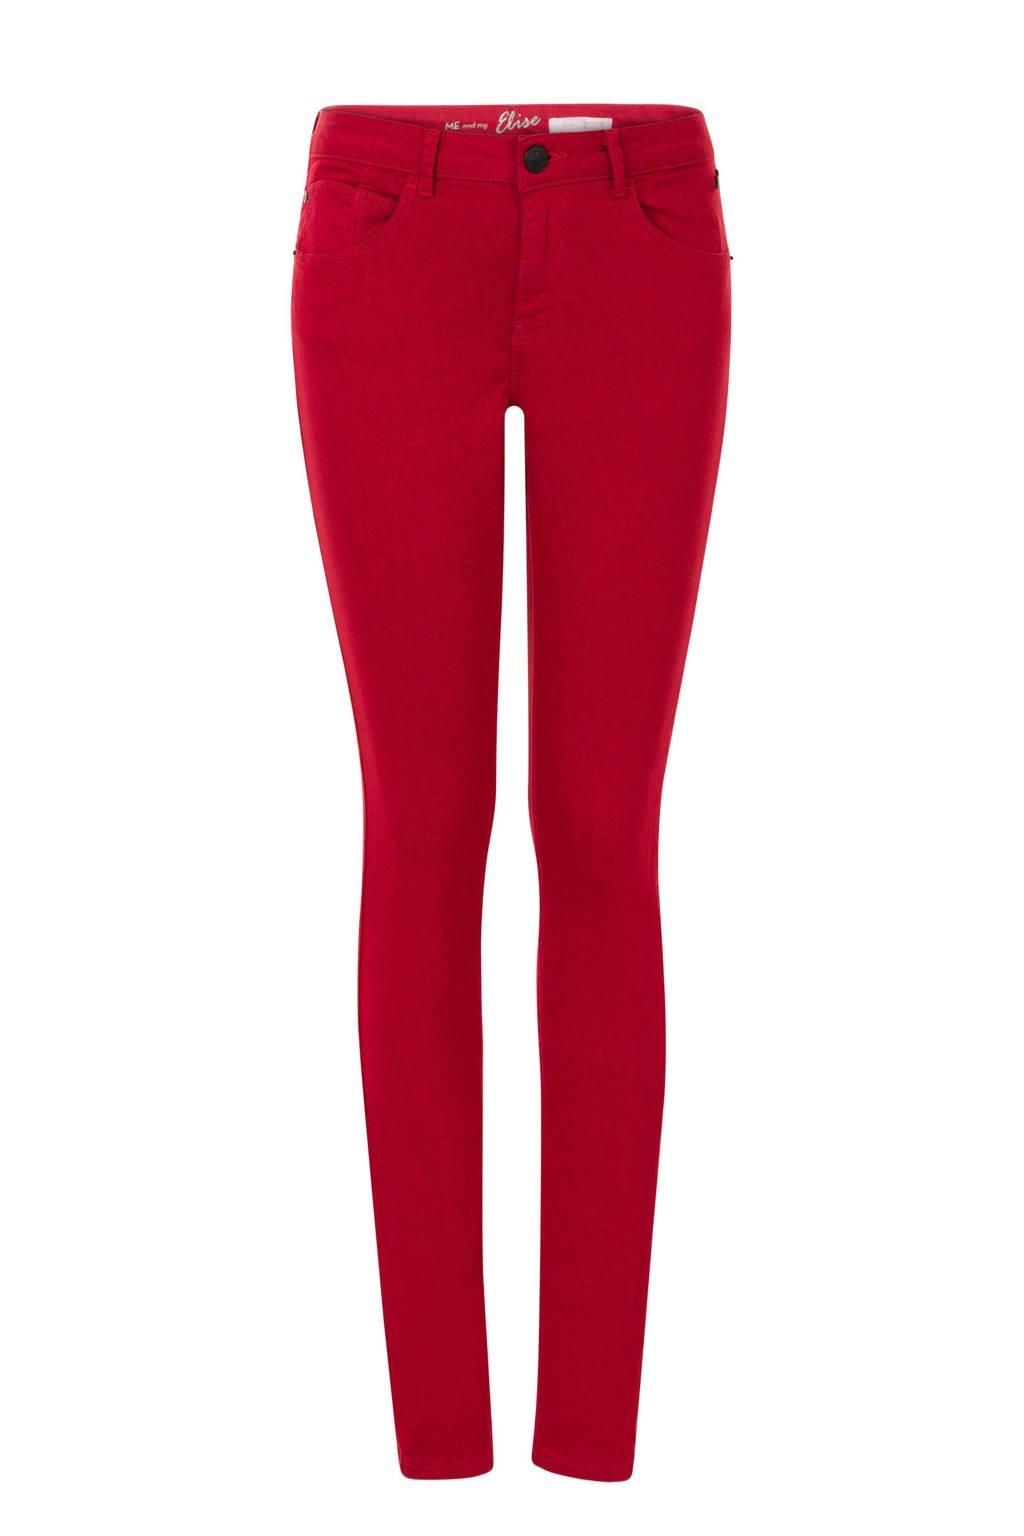 Miss Etam Lang slim fit jeans 36 inch rood, Rood